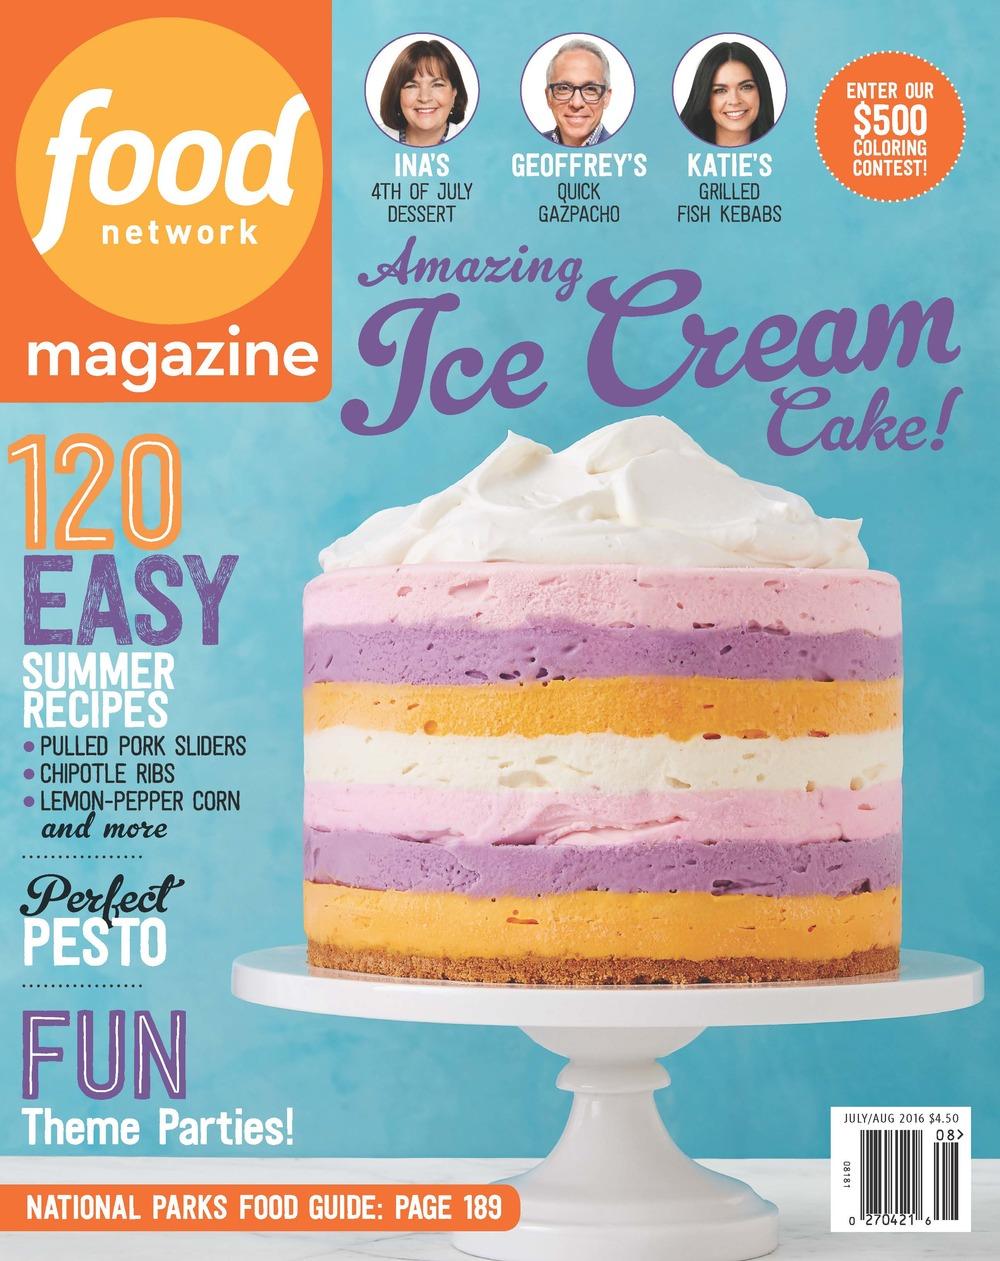 FOOD NETWORK Magazine NOVEMBER 2016 Thanksgiving Issue Bread Bowl Dips Root Vege